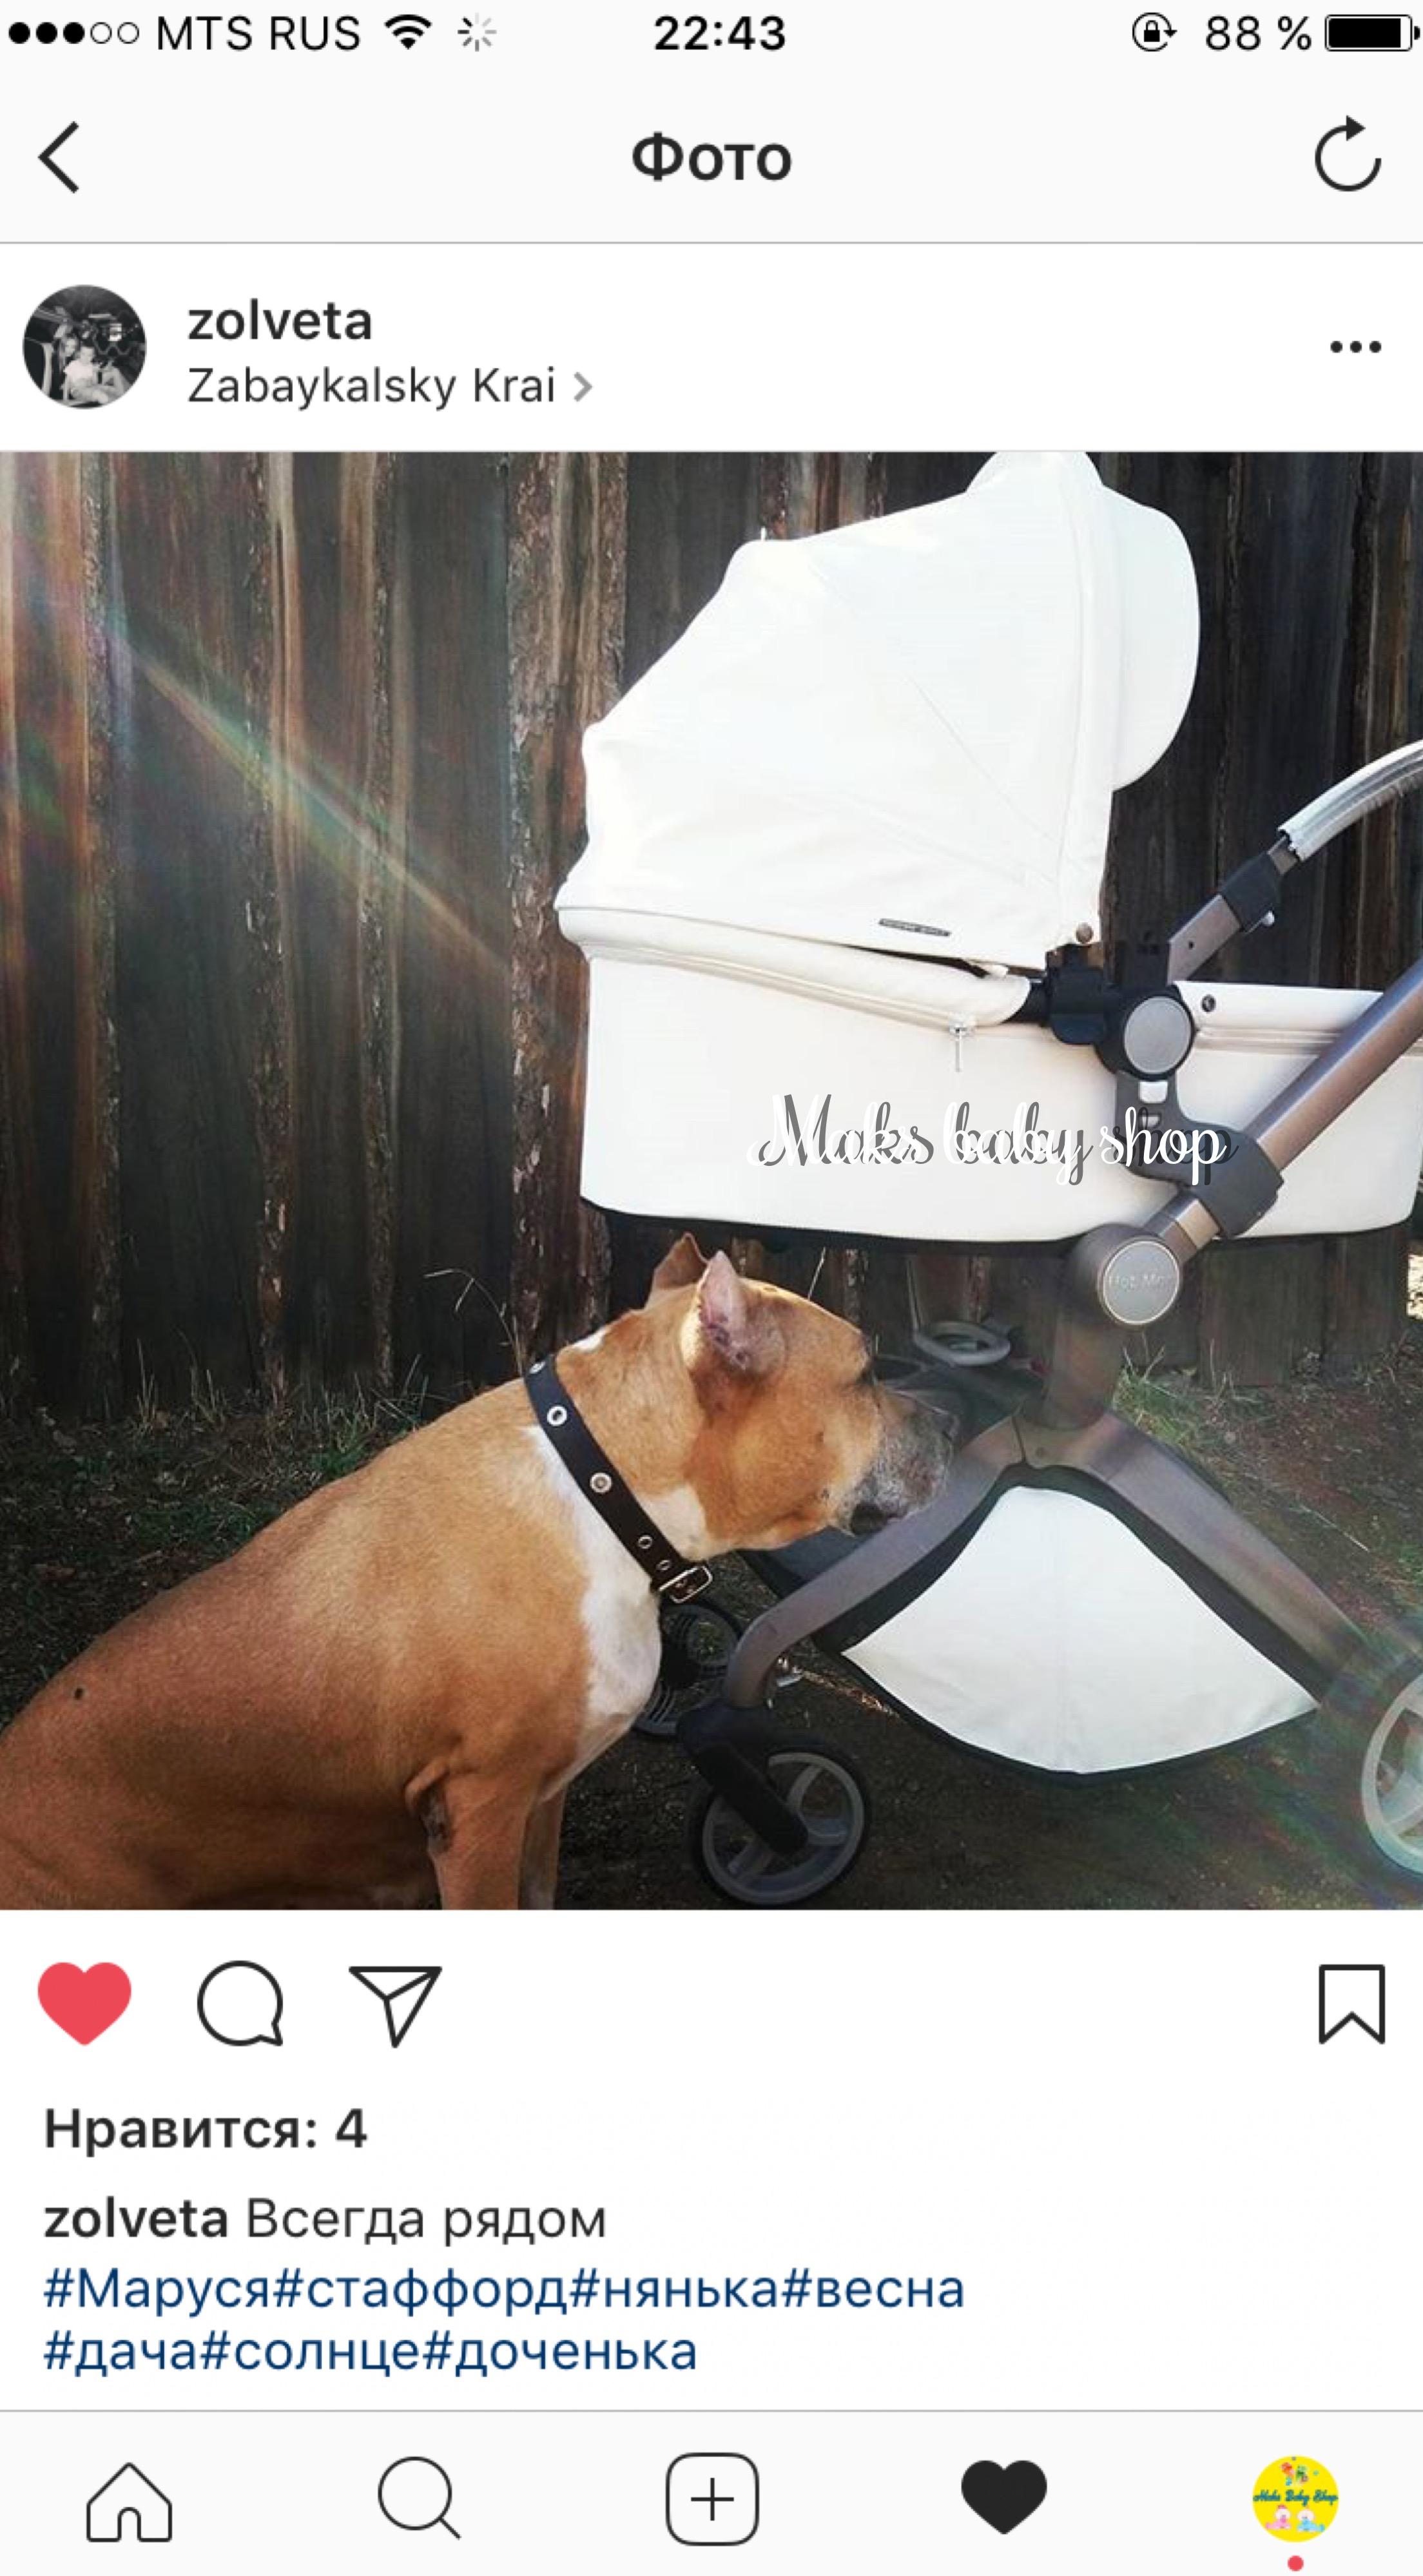 коляска hot mom хабаровск